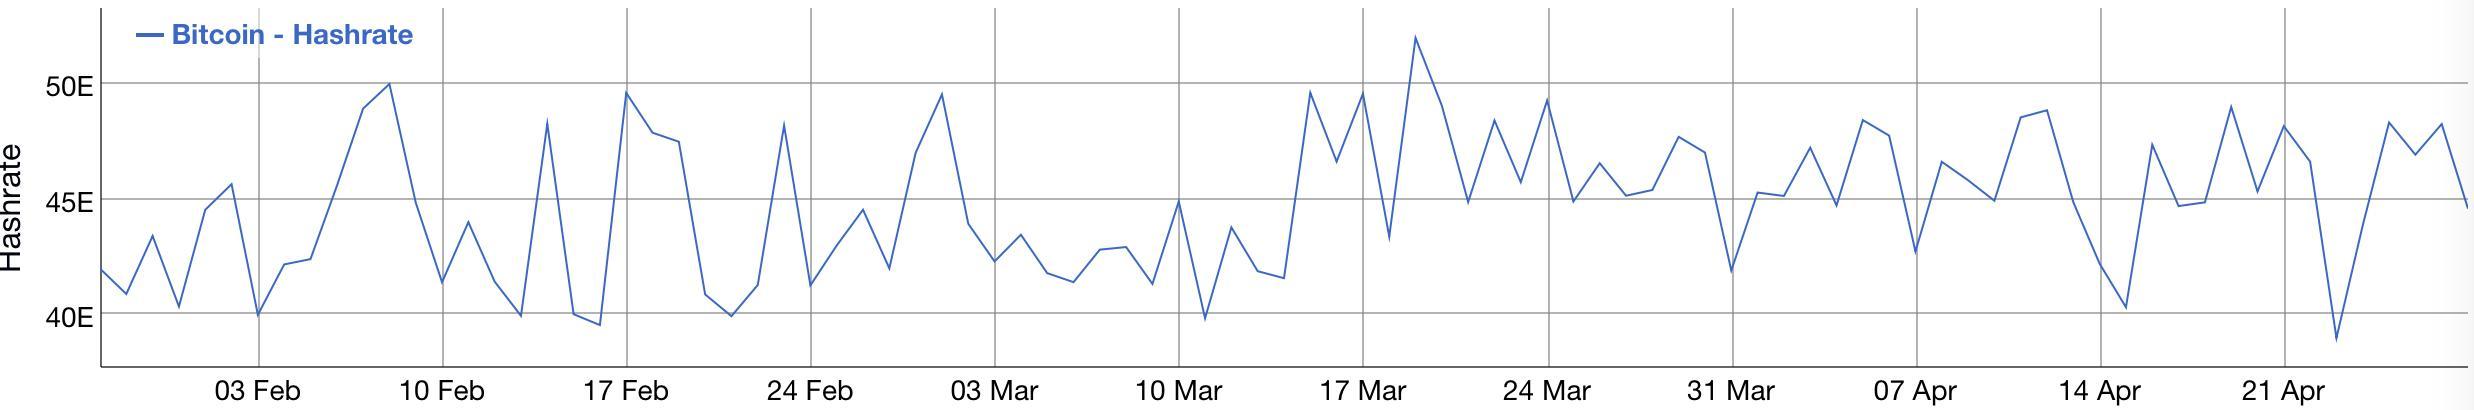 LTC全网算力在本月达到近4个月高点后,首次出现明显回落插图(8)